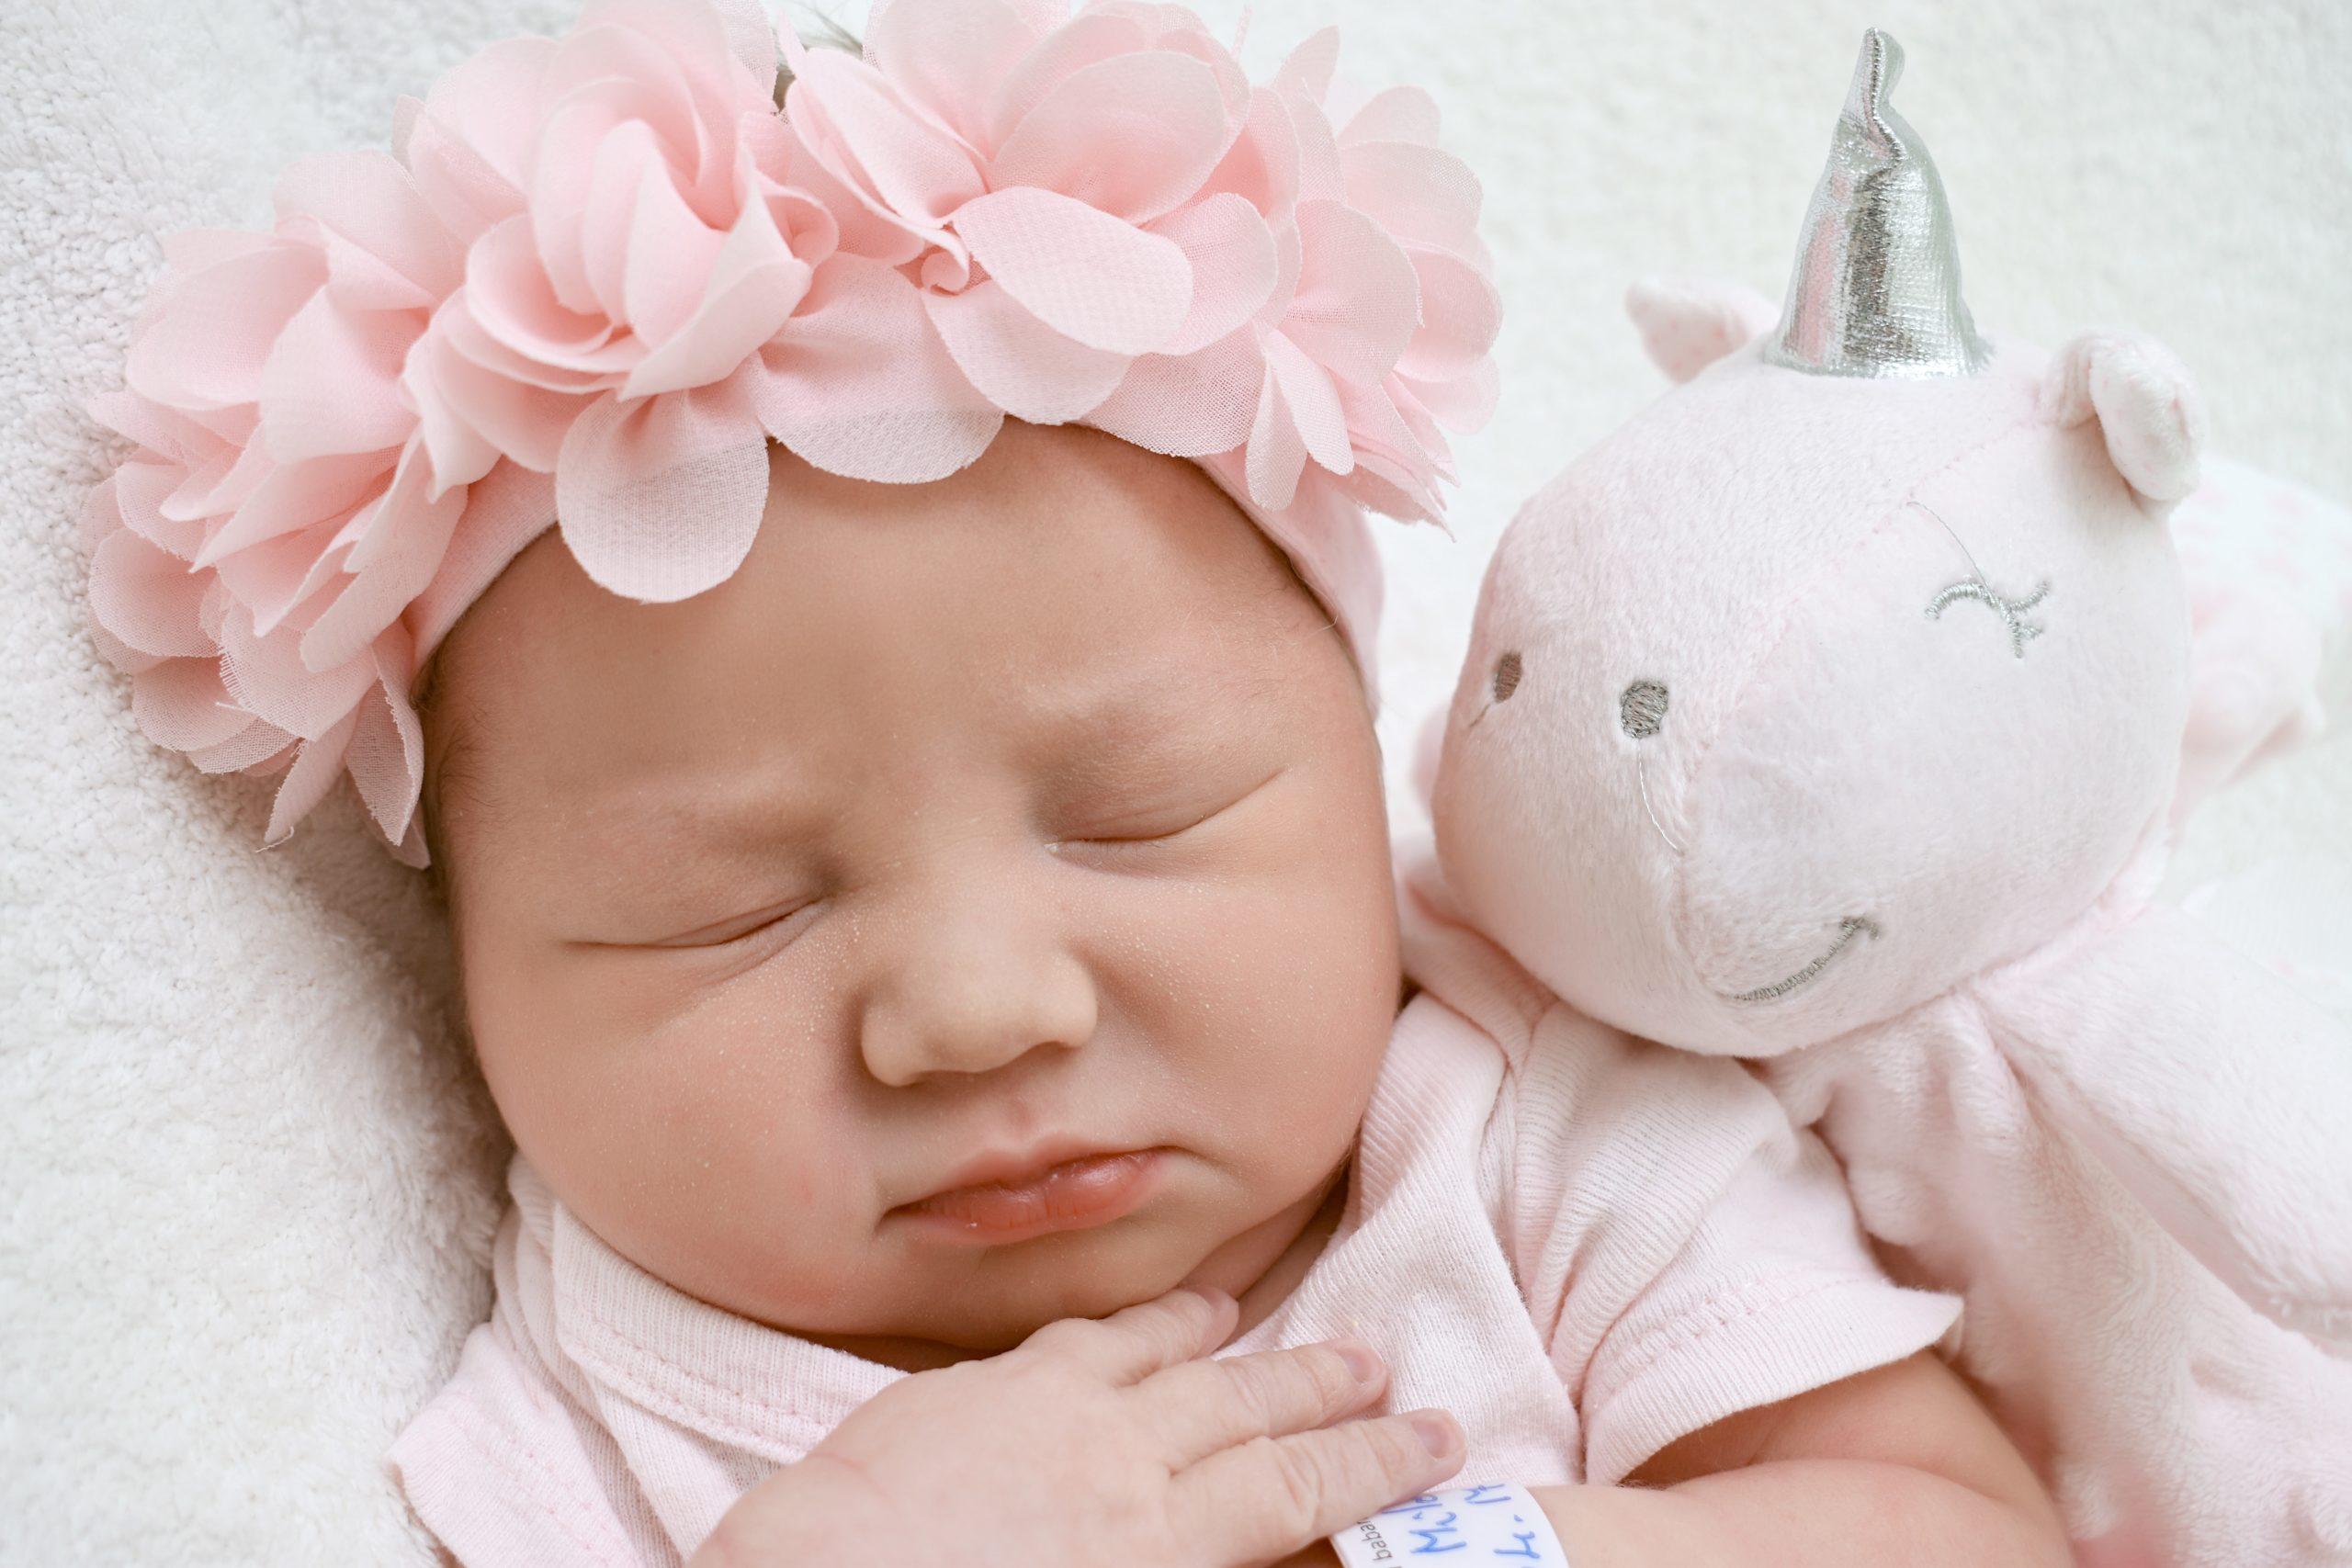 suasana nyaman agar bayi tidur cepat